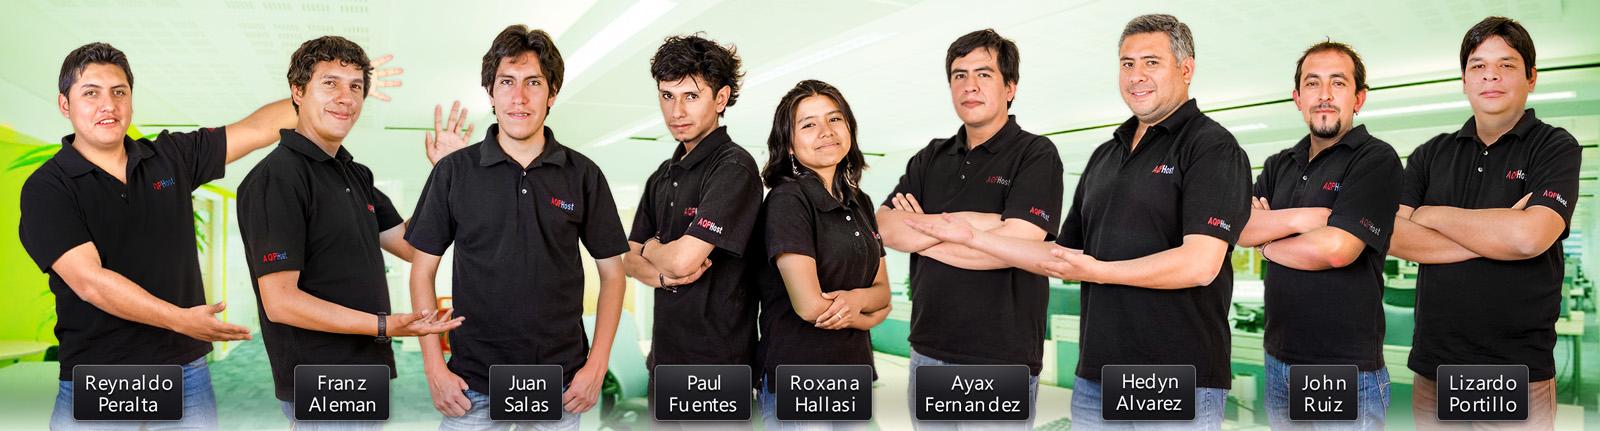 personal de Evolucion Peru SRL